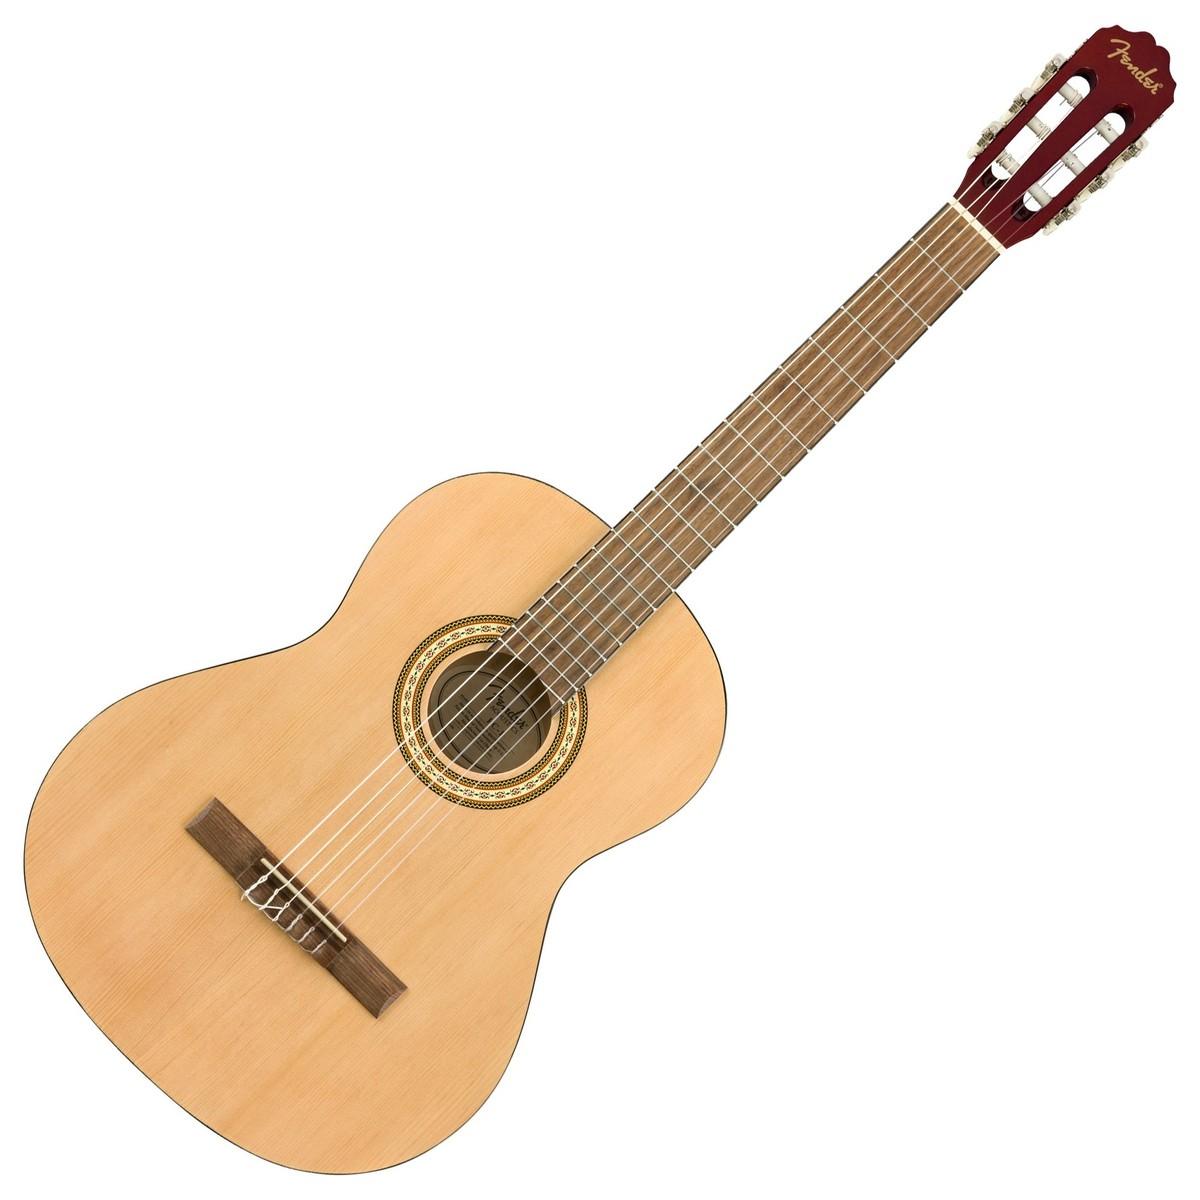 Fender Fc 1 Classical Guitar